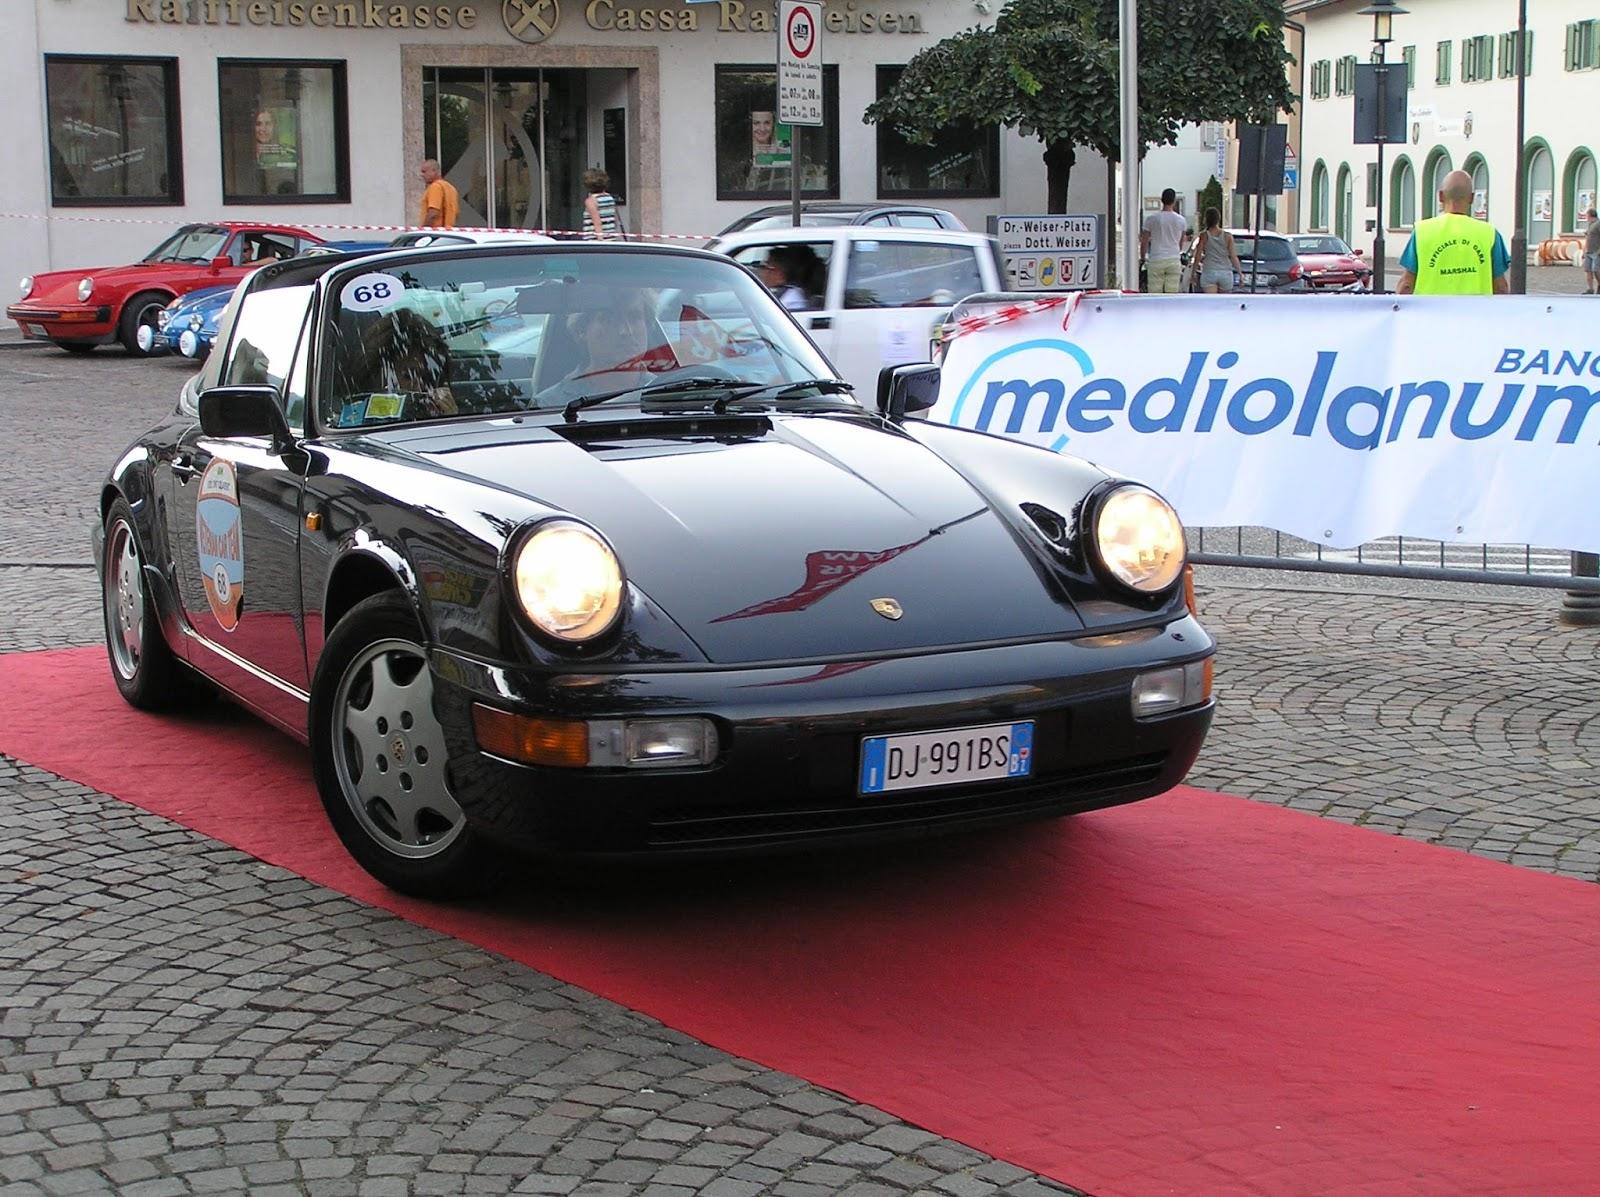 Automotovintage - Milleitinerari: Le Porsche tornano al ...